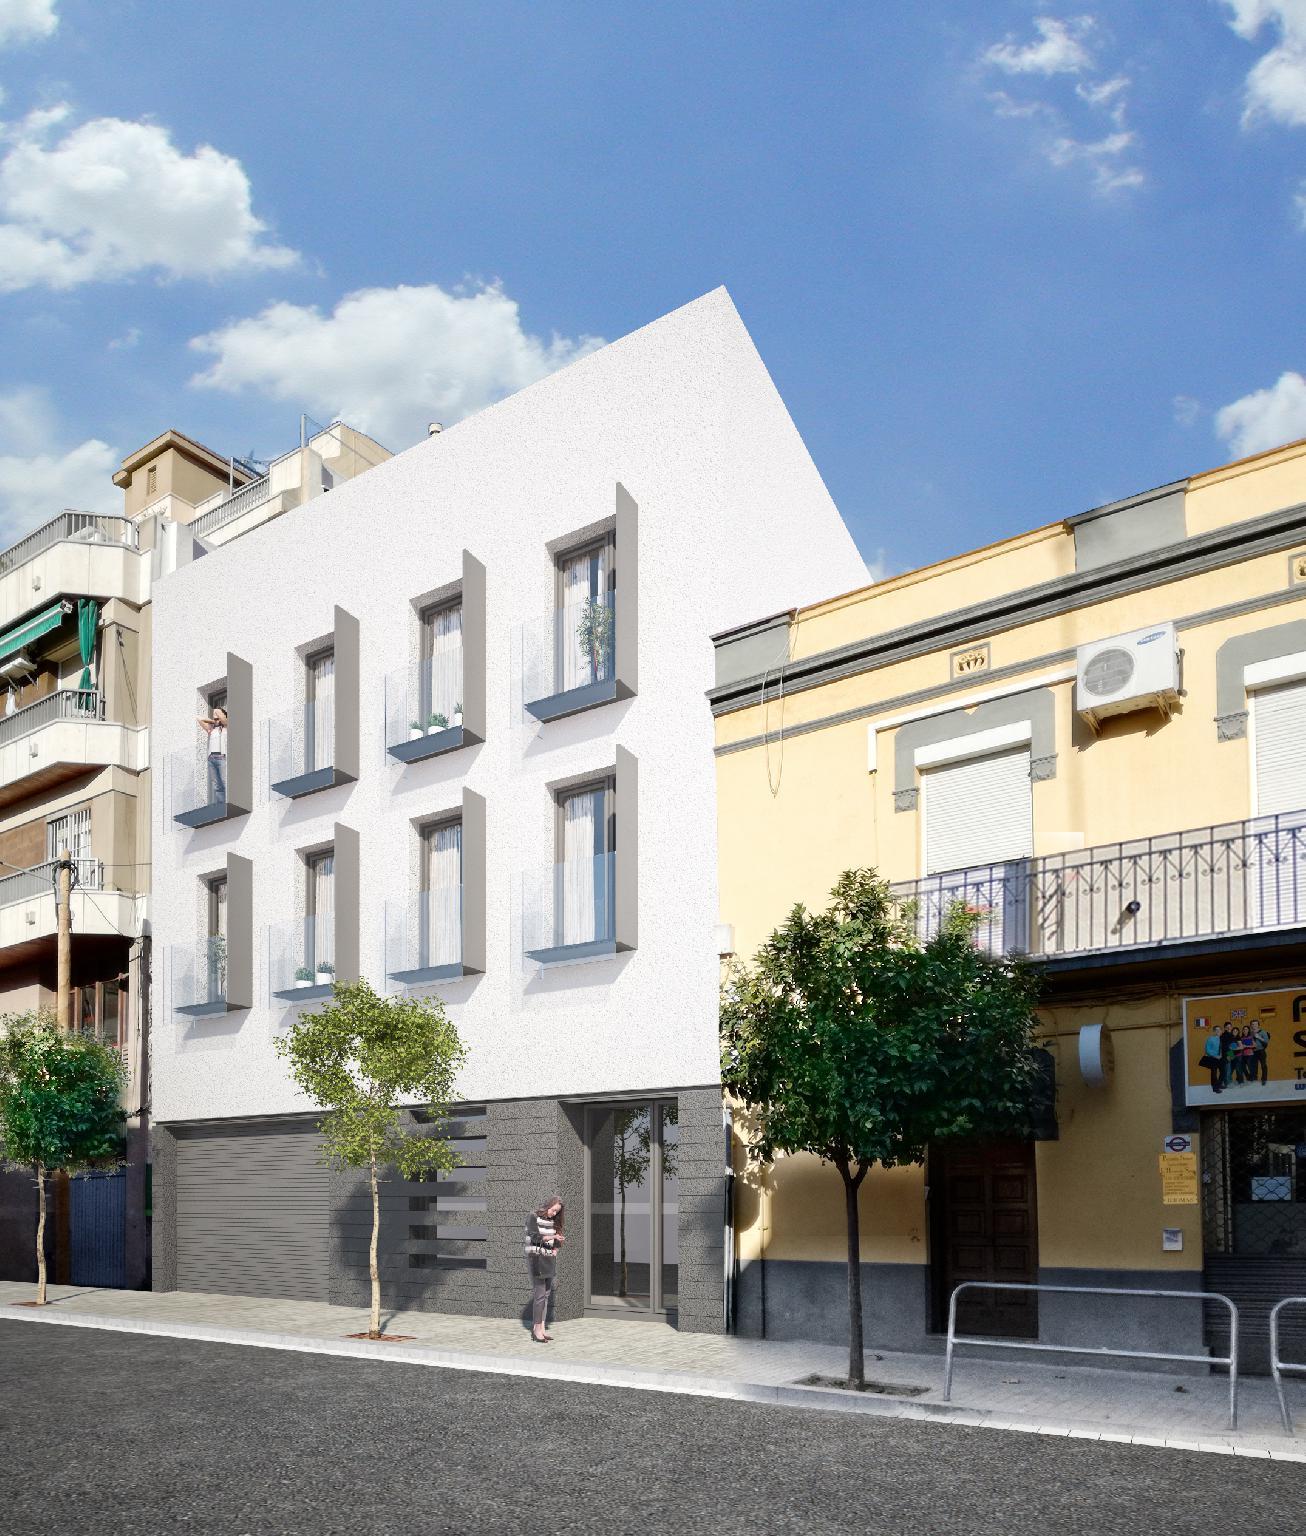 Piso centre hospitalet de llobregat l barcelona 182695 - Pisos en hospitalet centro ...